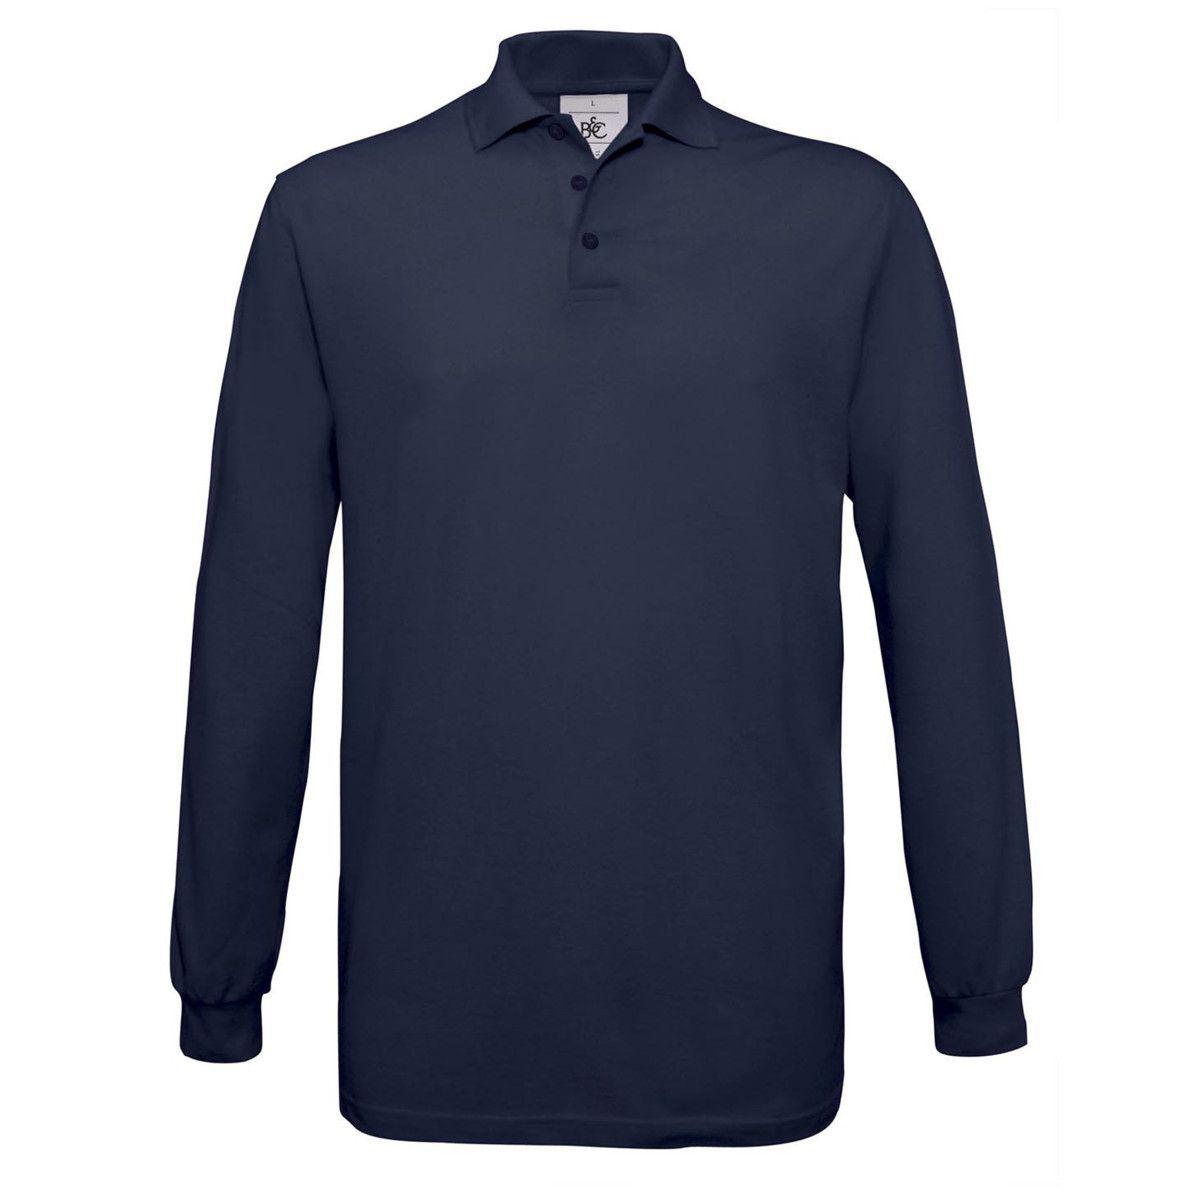 B&C Safran Long Sleeve Piqué Polo Shirts Mens (Navy)